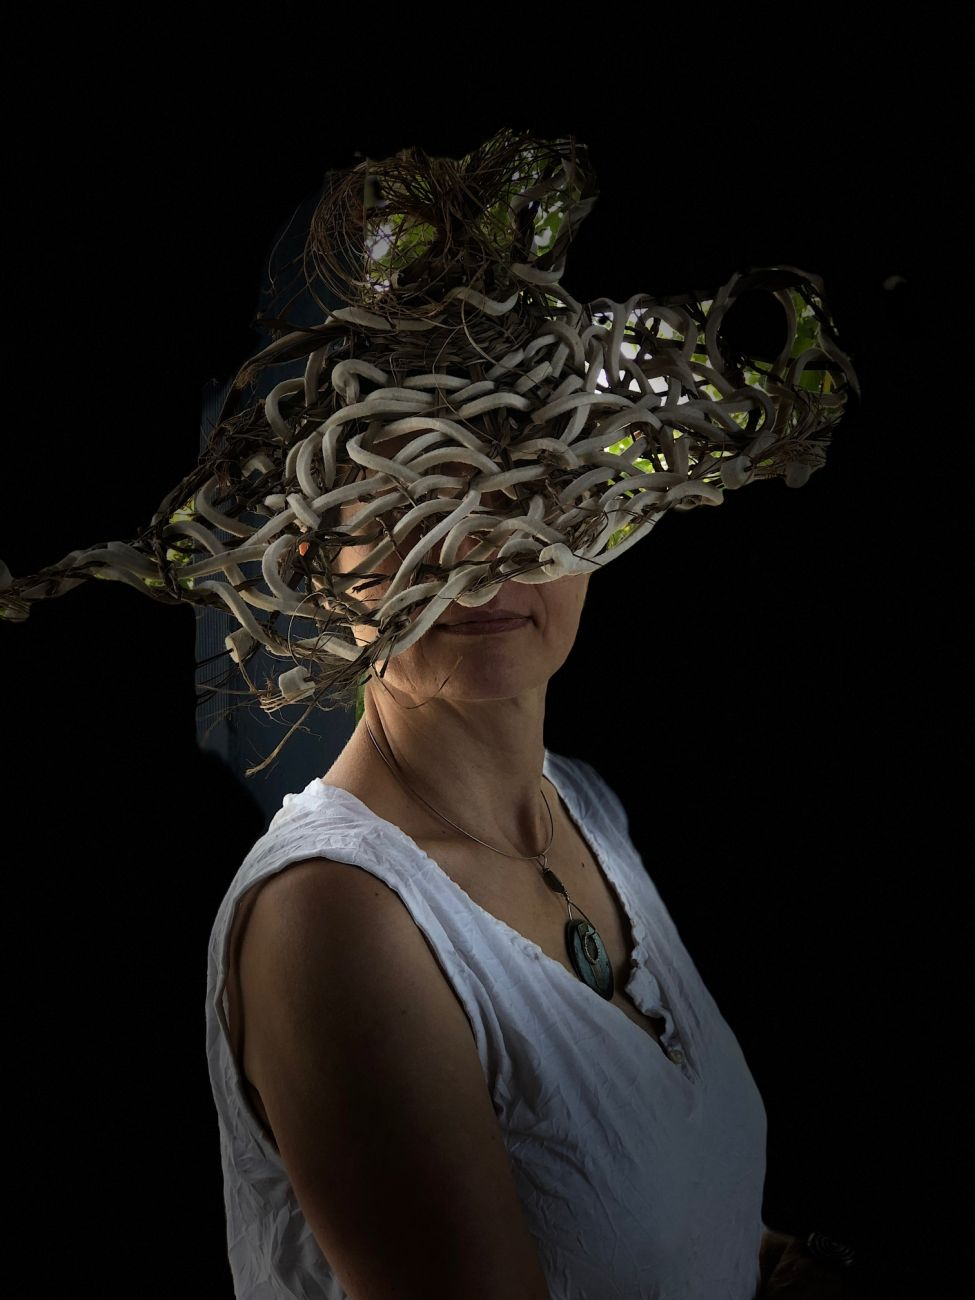 Knitted hat by Waltraud Reiner